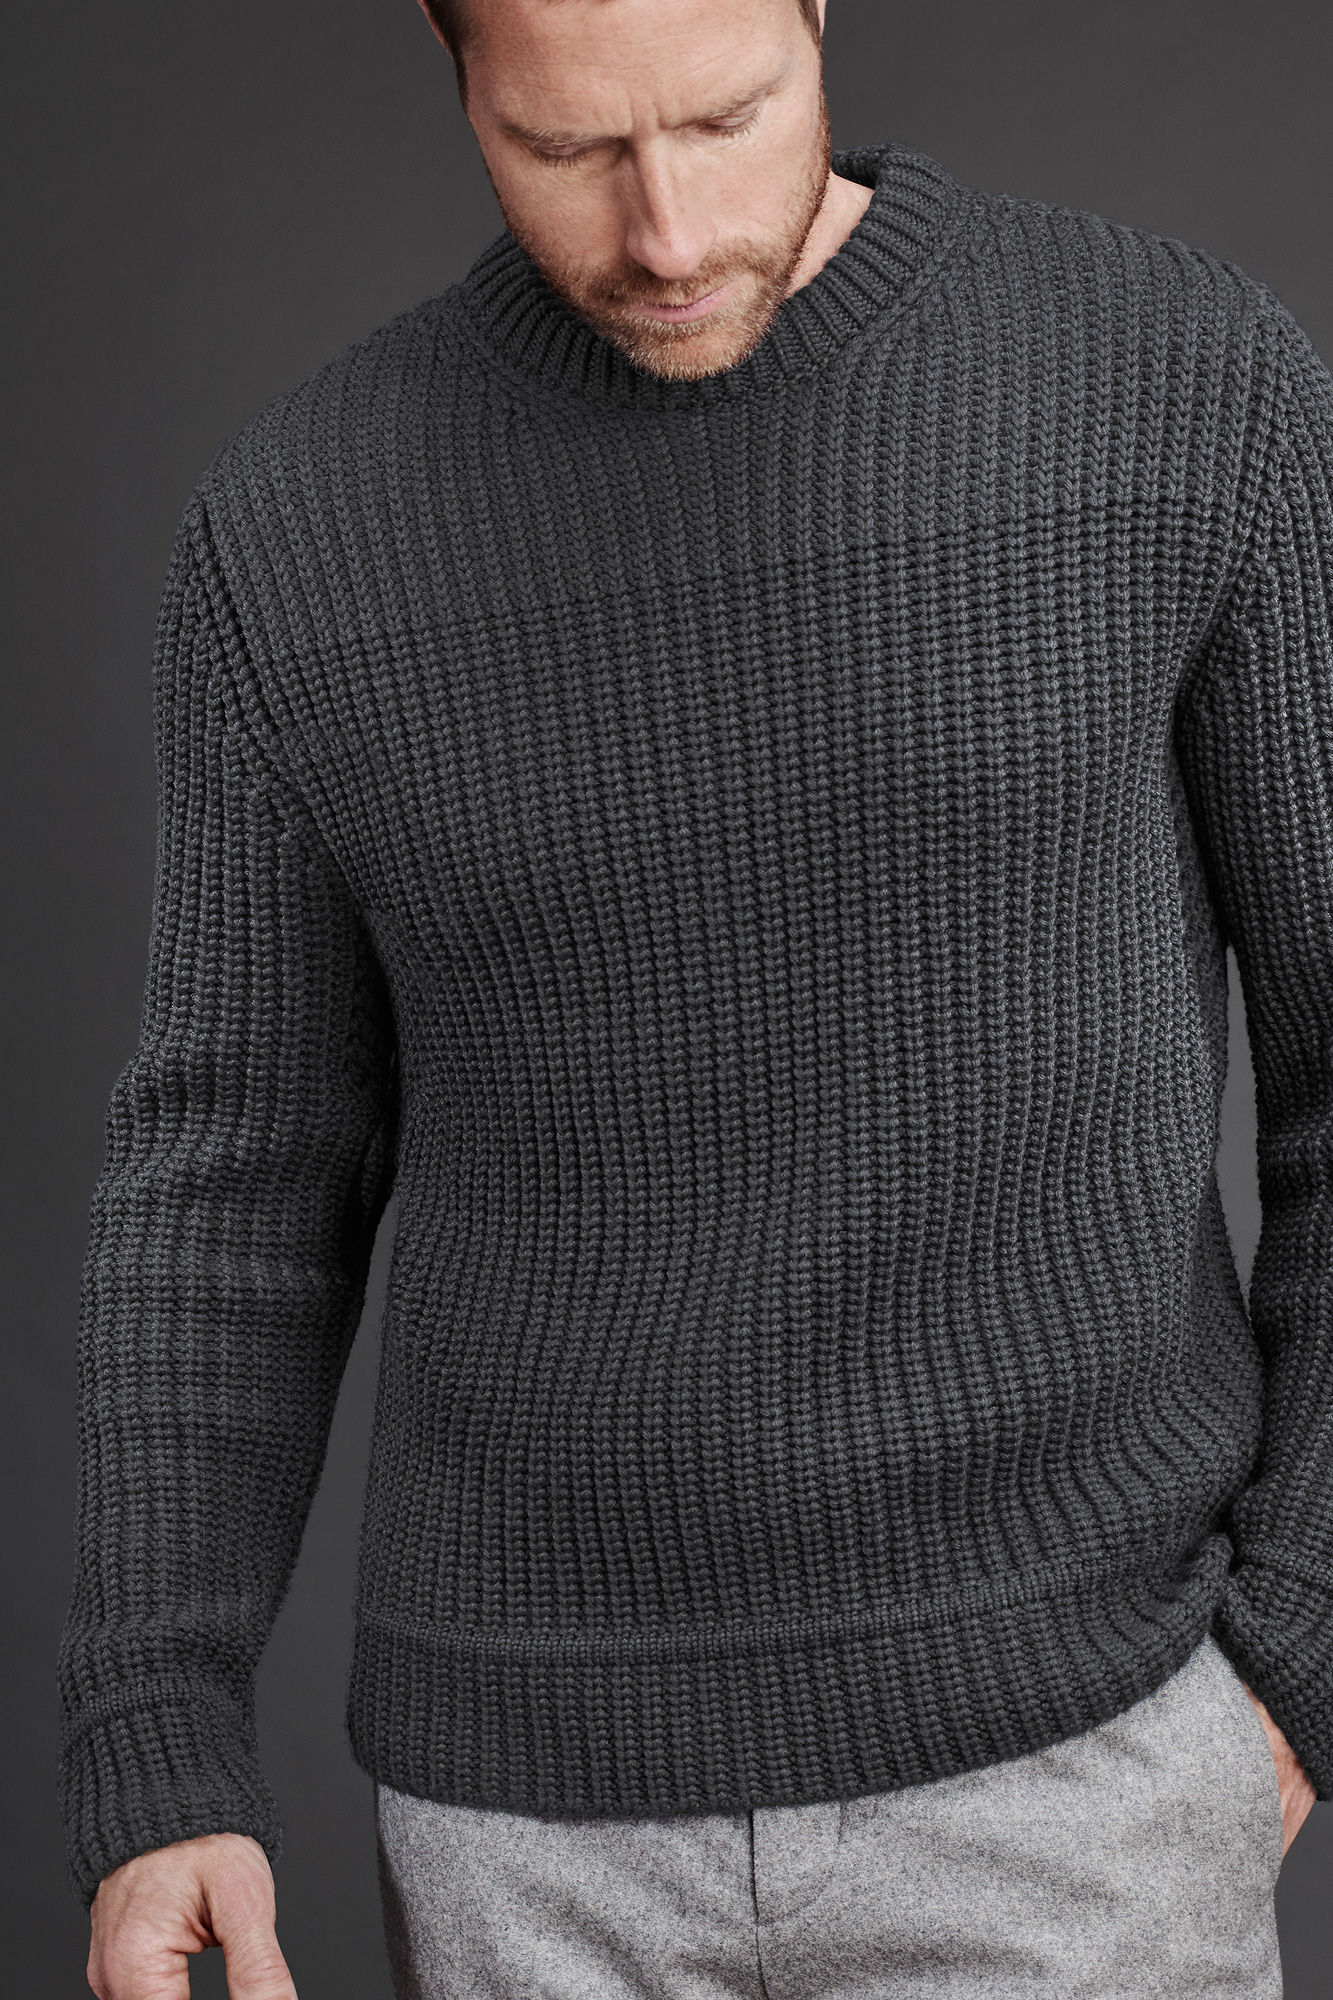 Canada Goose Galloway Merino Wool Sweater Sast Cheap Price GY1prm6NgZ